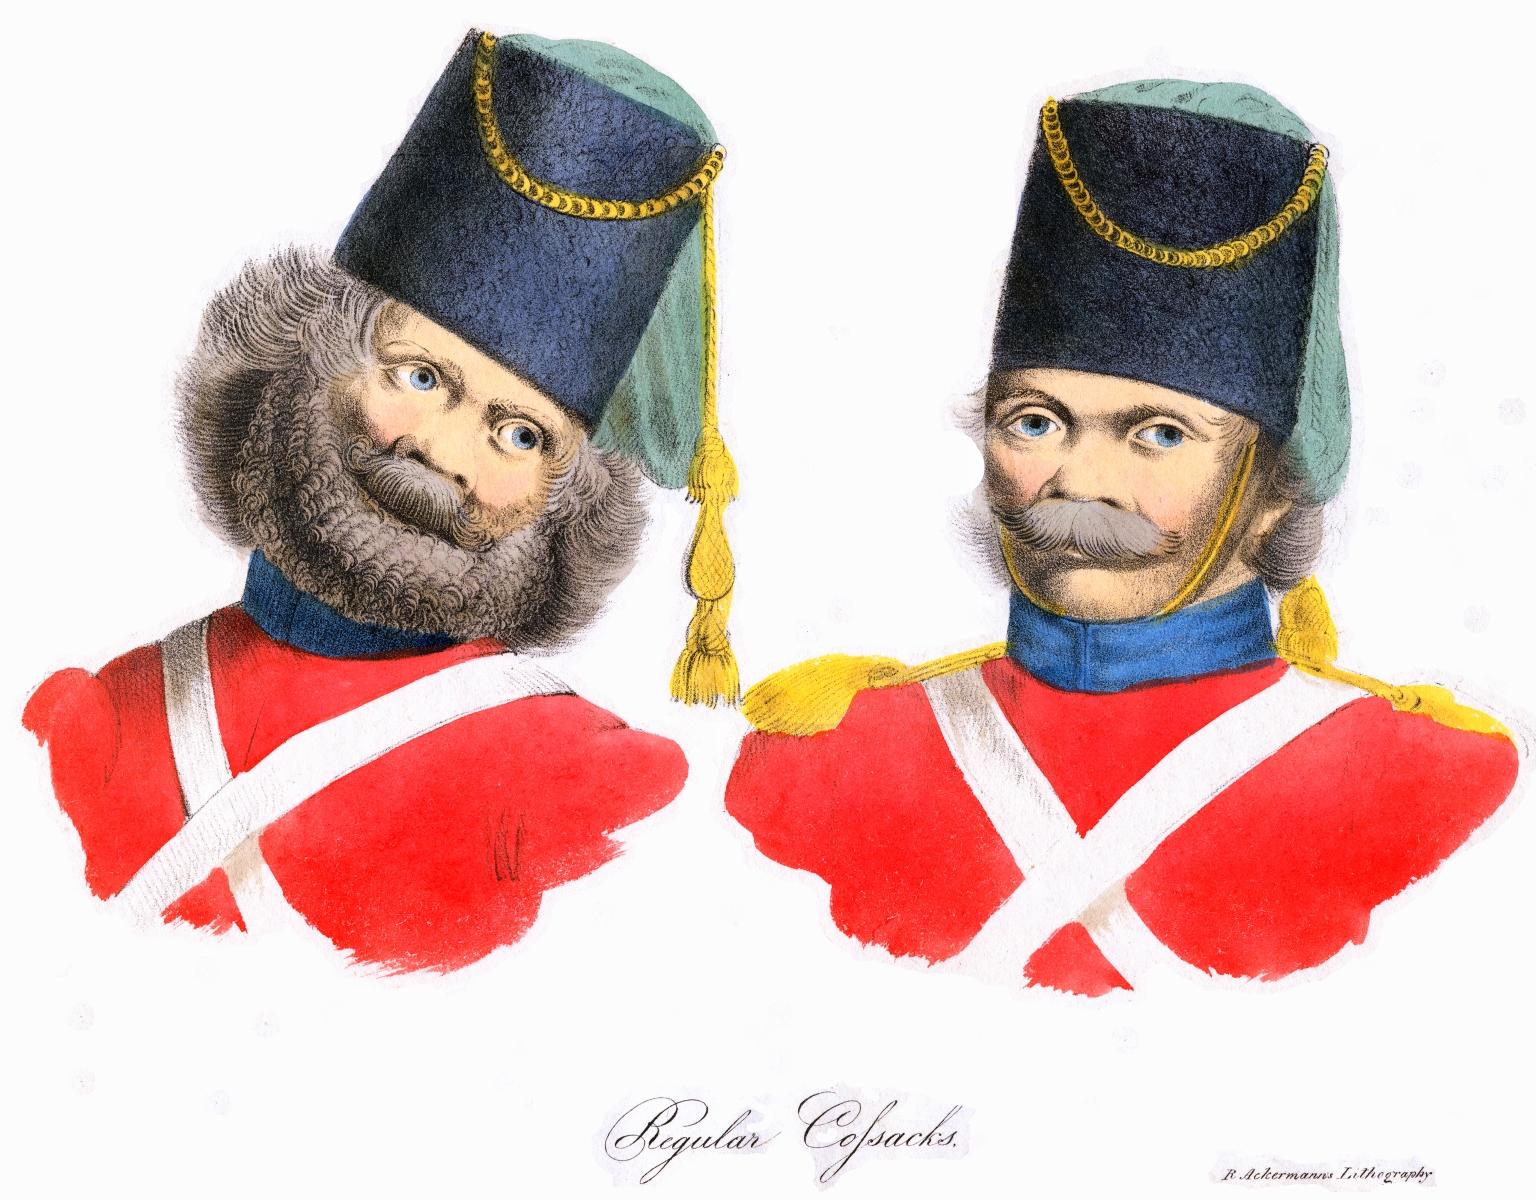 Гравюра из Characteristic Portraits of the various Tribes of Cossacks (1820)